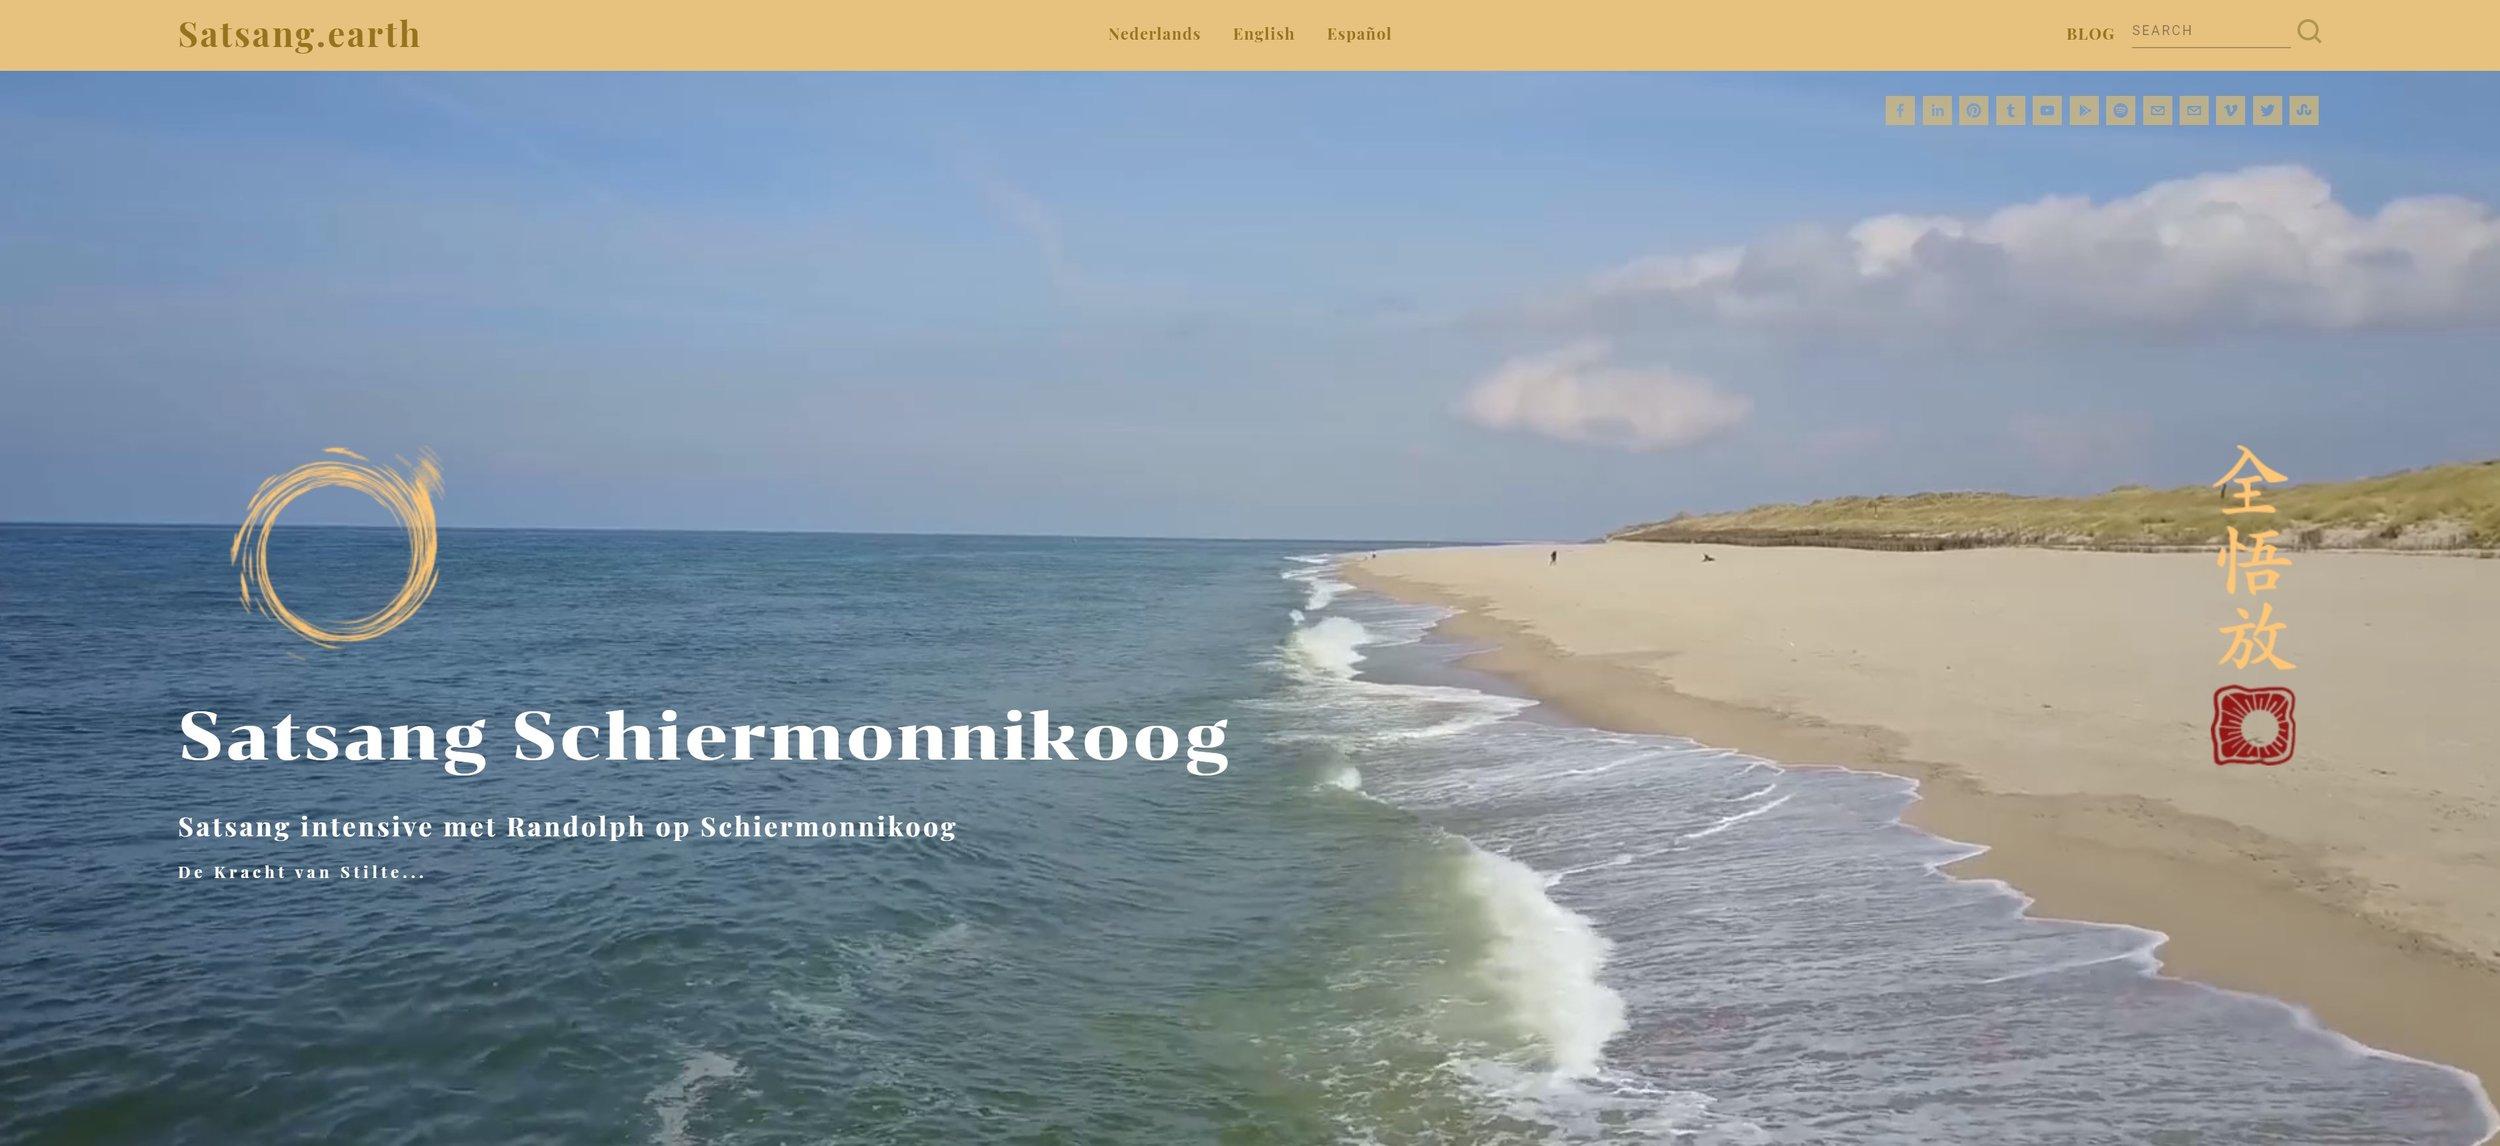 Satsang Schiermonnikoog Satsang.earth